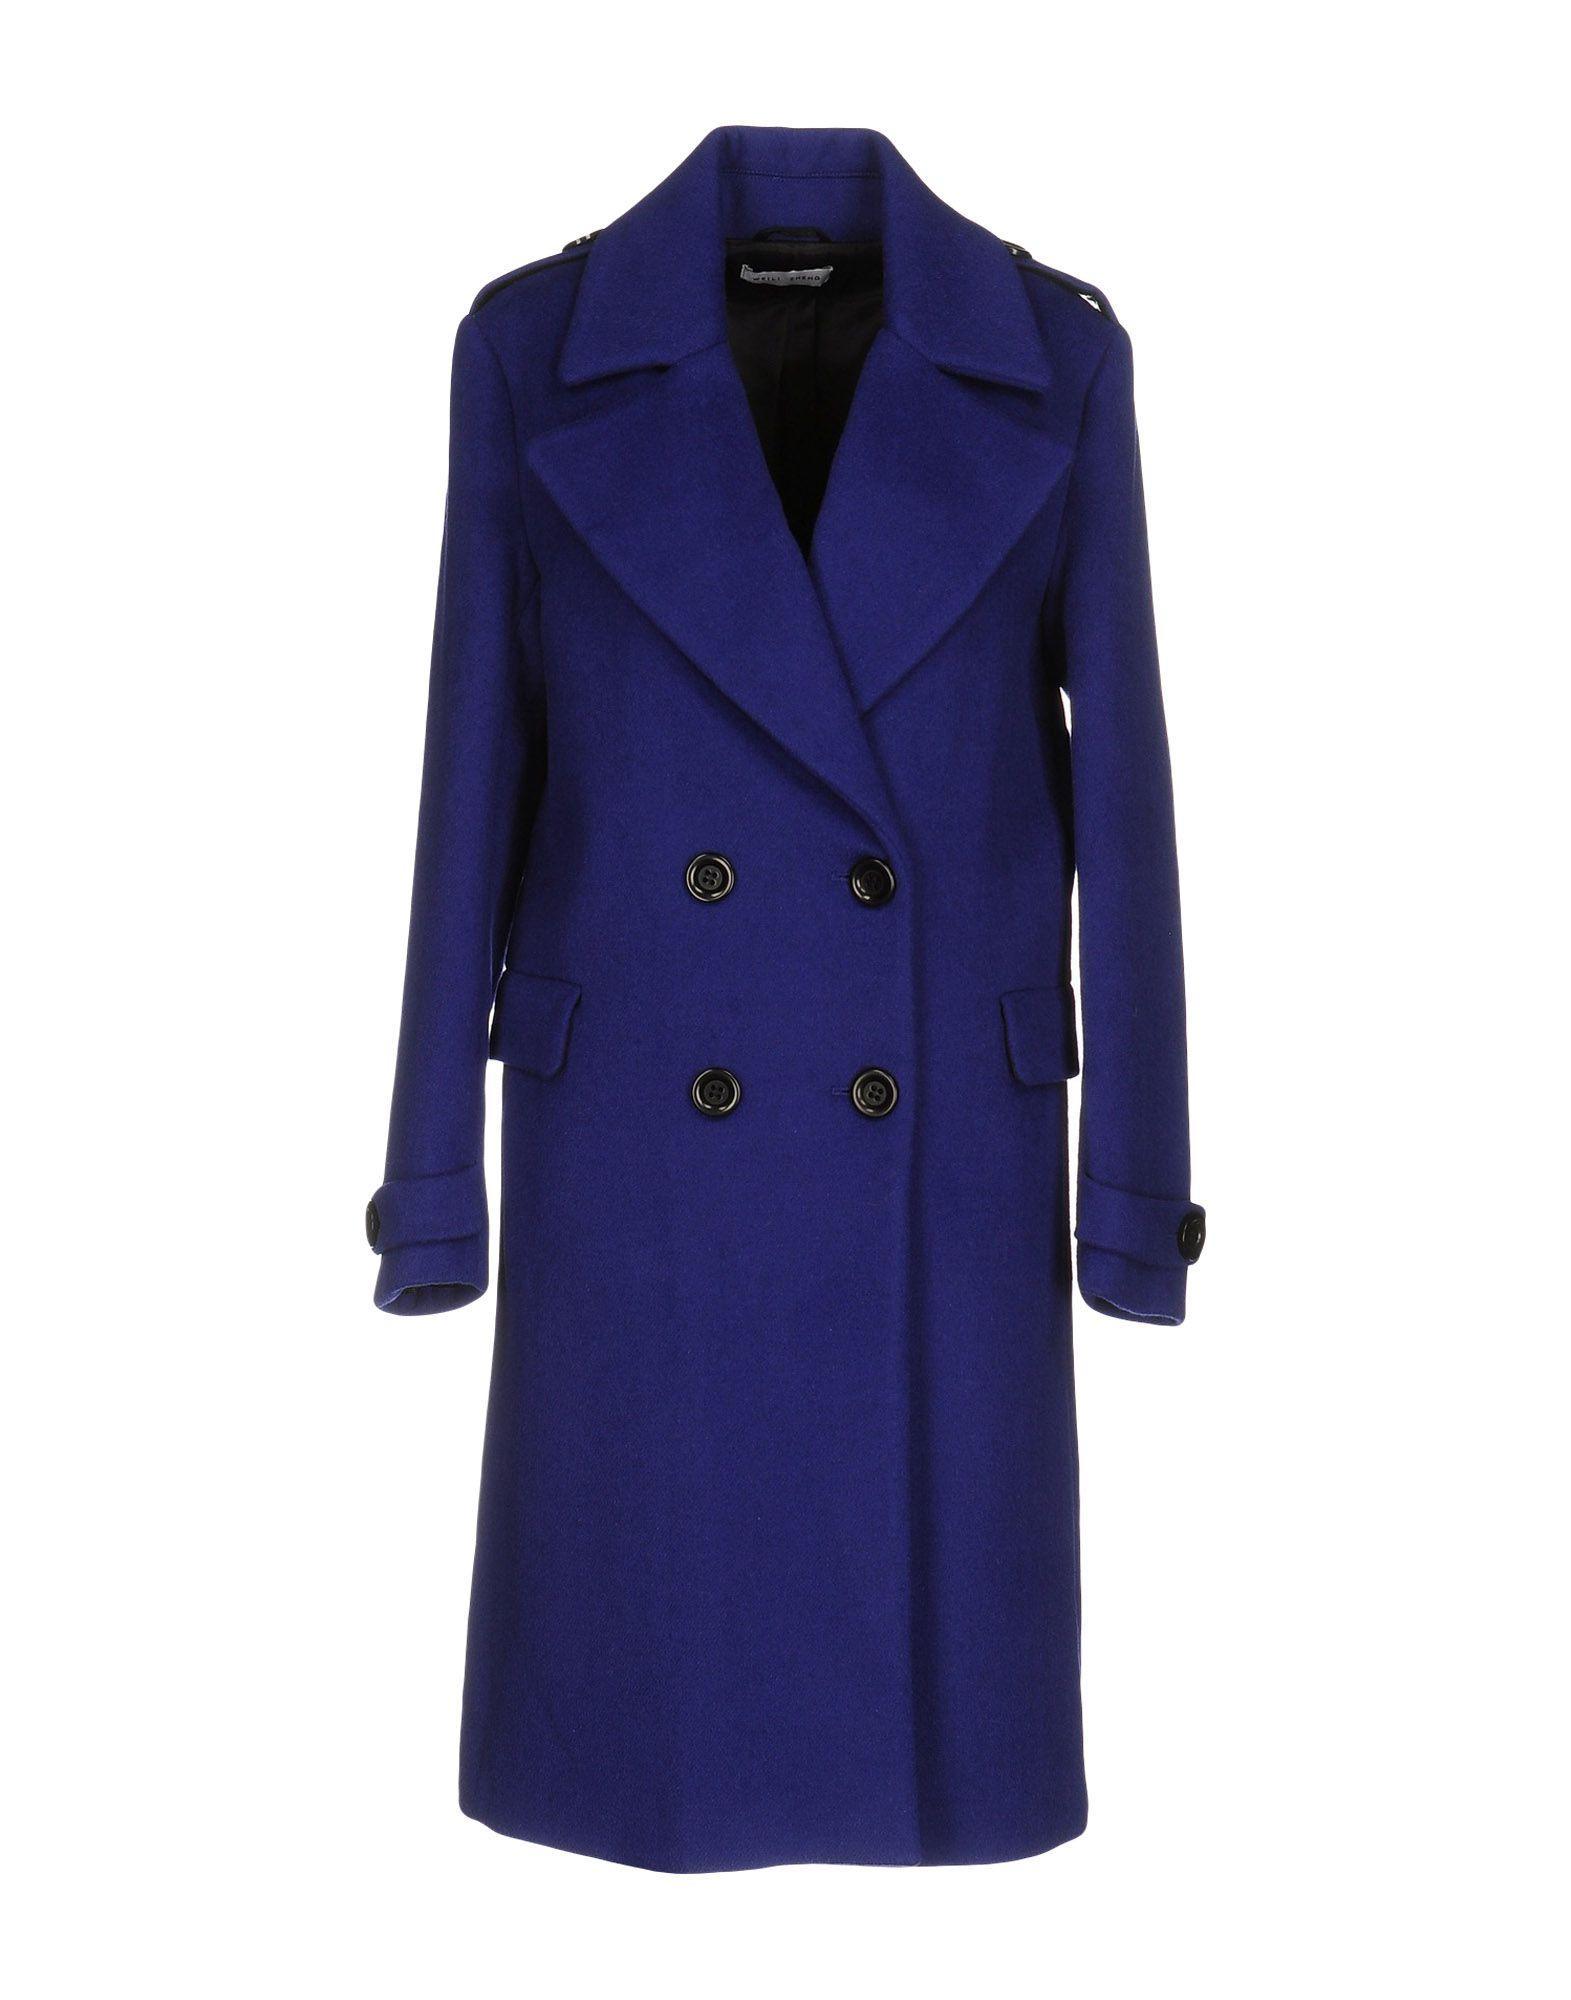 Weili Zheng Coats In Bright Blue